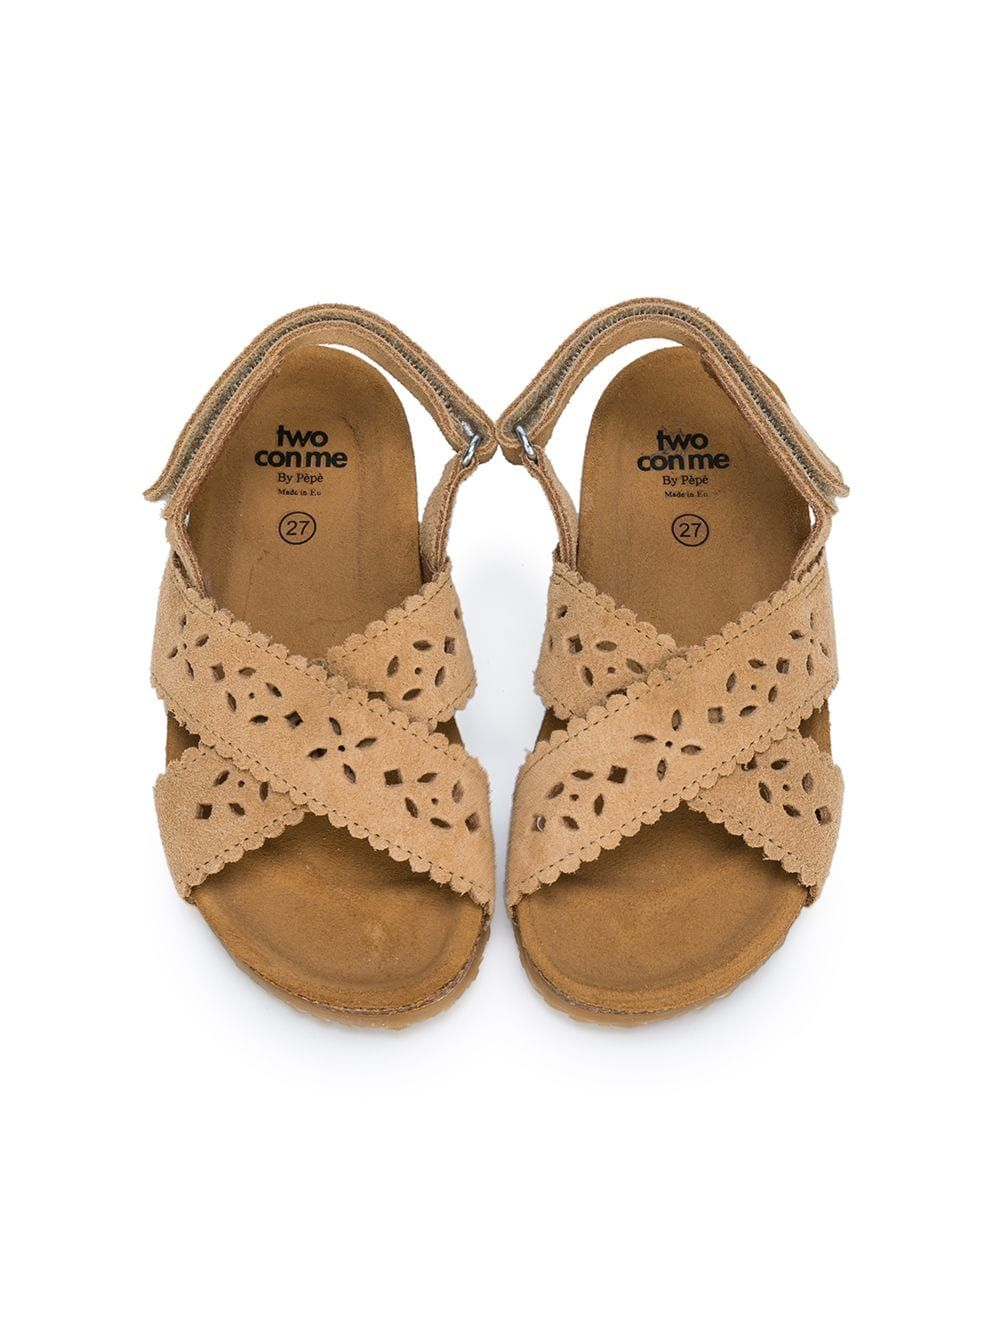 df178bd8fb9 Pépé Kids Crossover Sandals in 2019 | girls sandals | Girls sandals ...